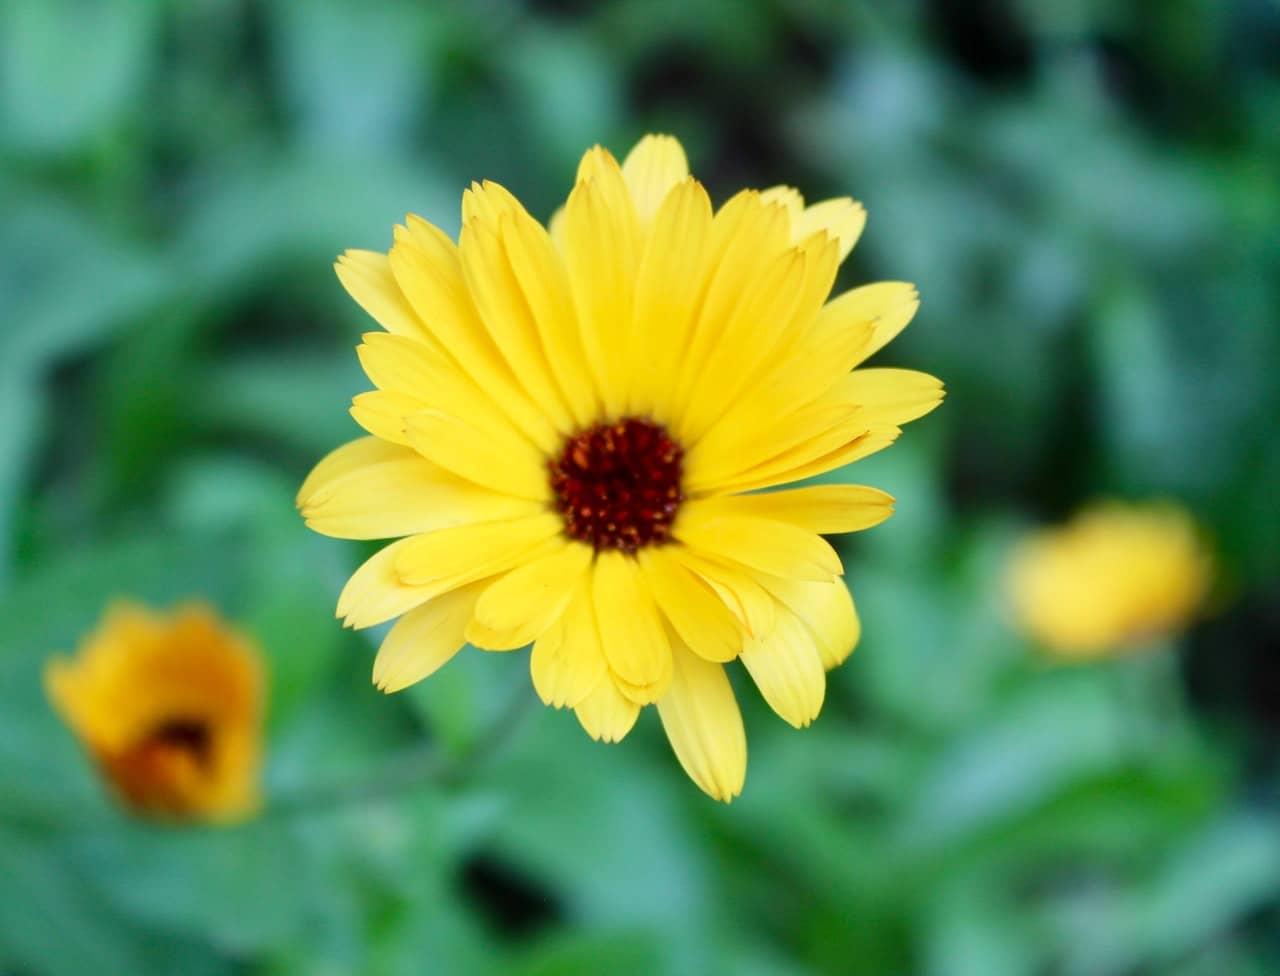 La caléndula produce flores amarillas